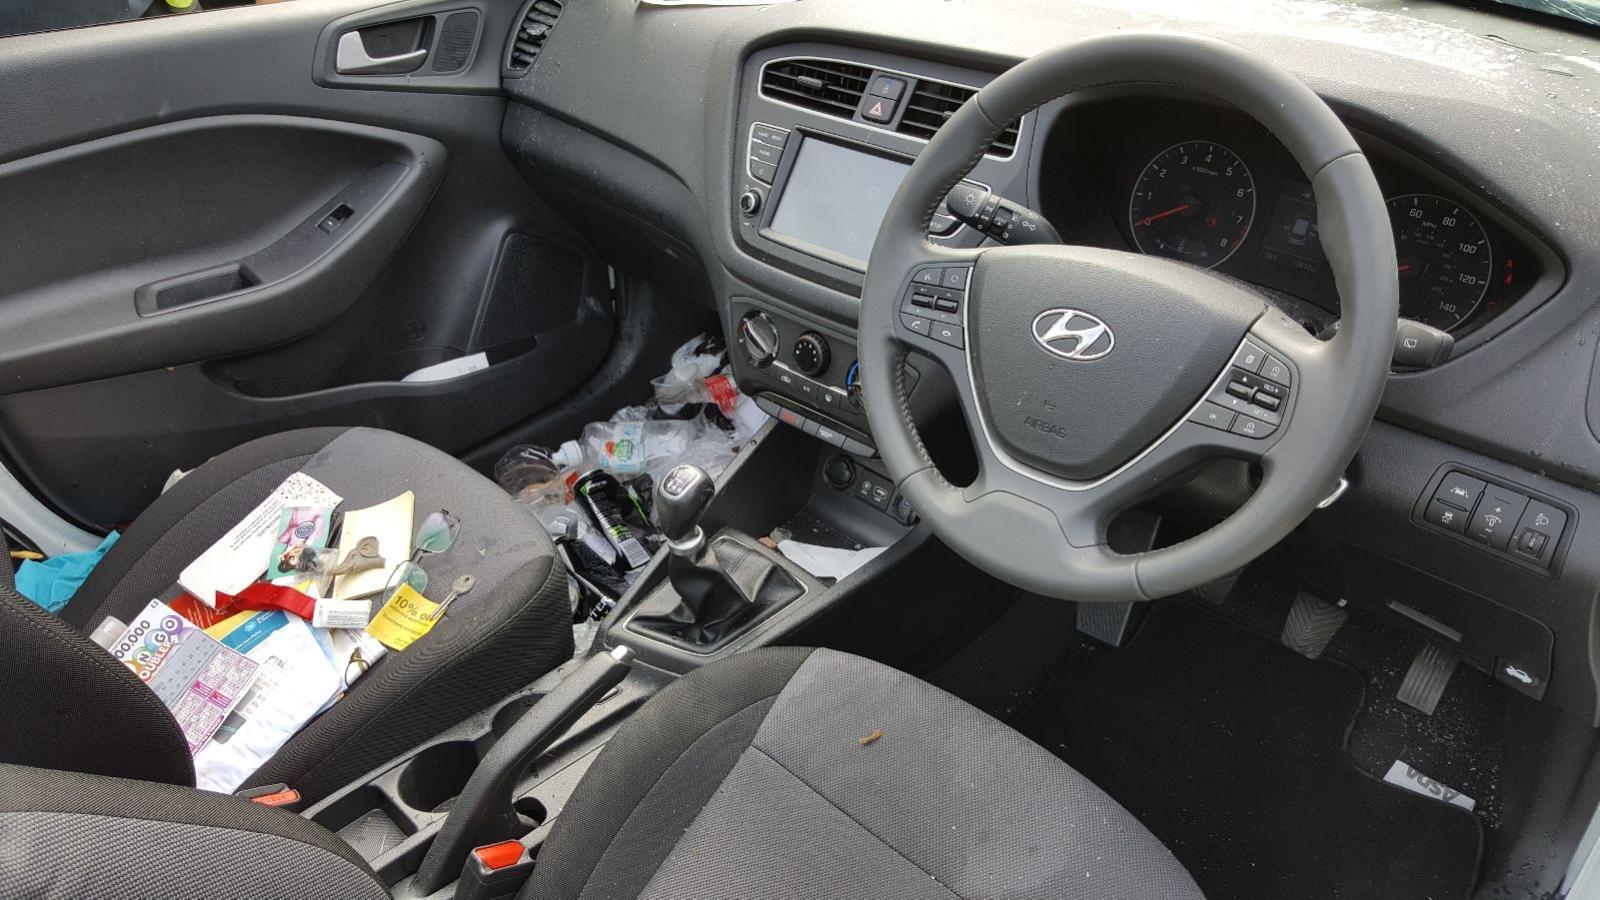 View Auto part Right Driveshaft Hyundai I20 2018